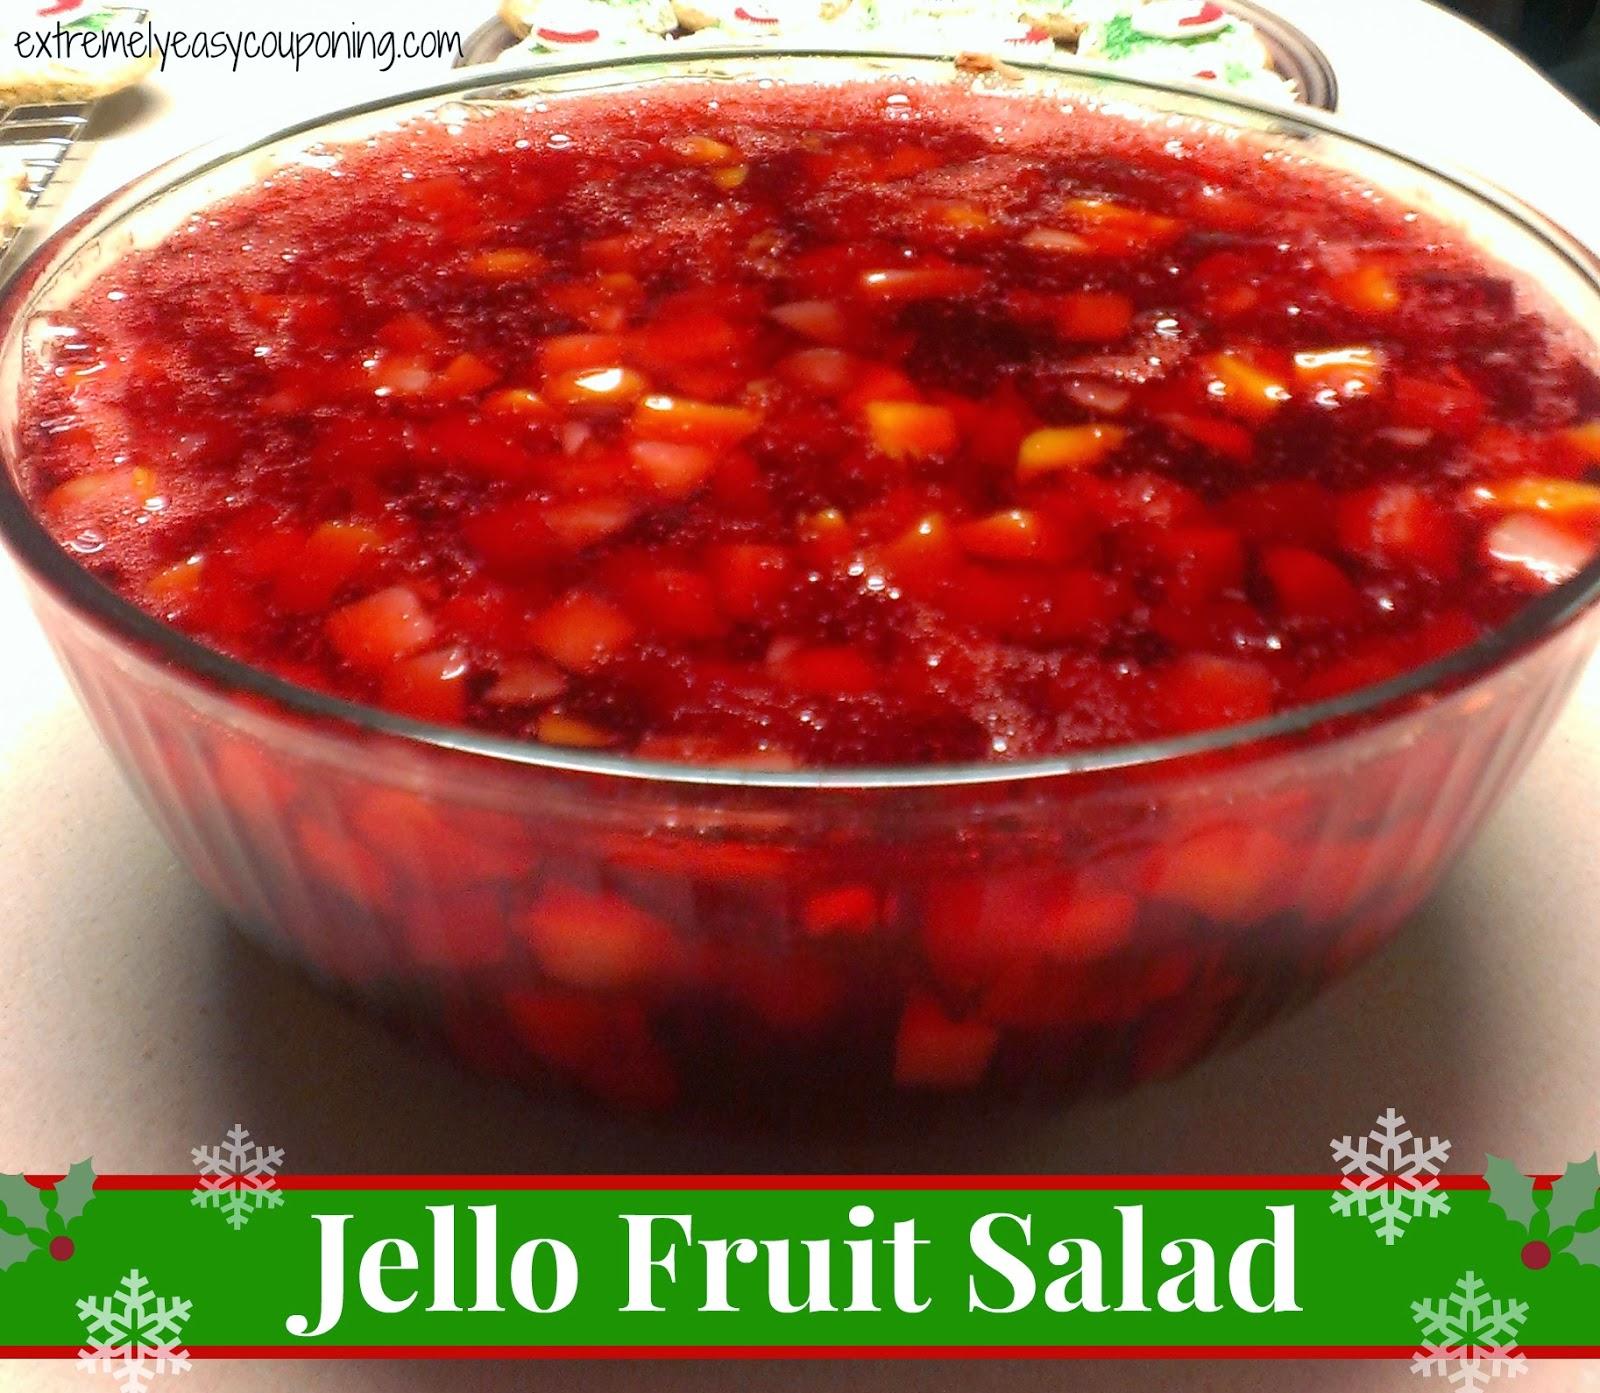 Jello Fruit Cocktail 15